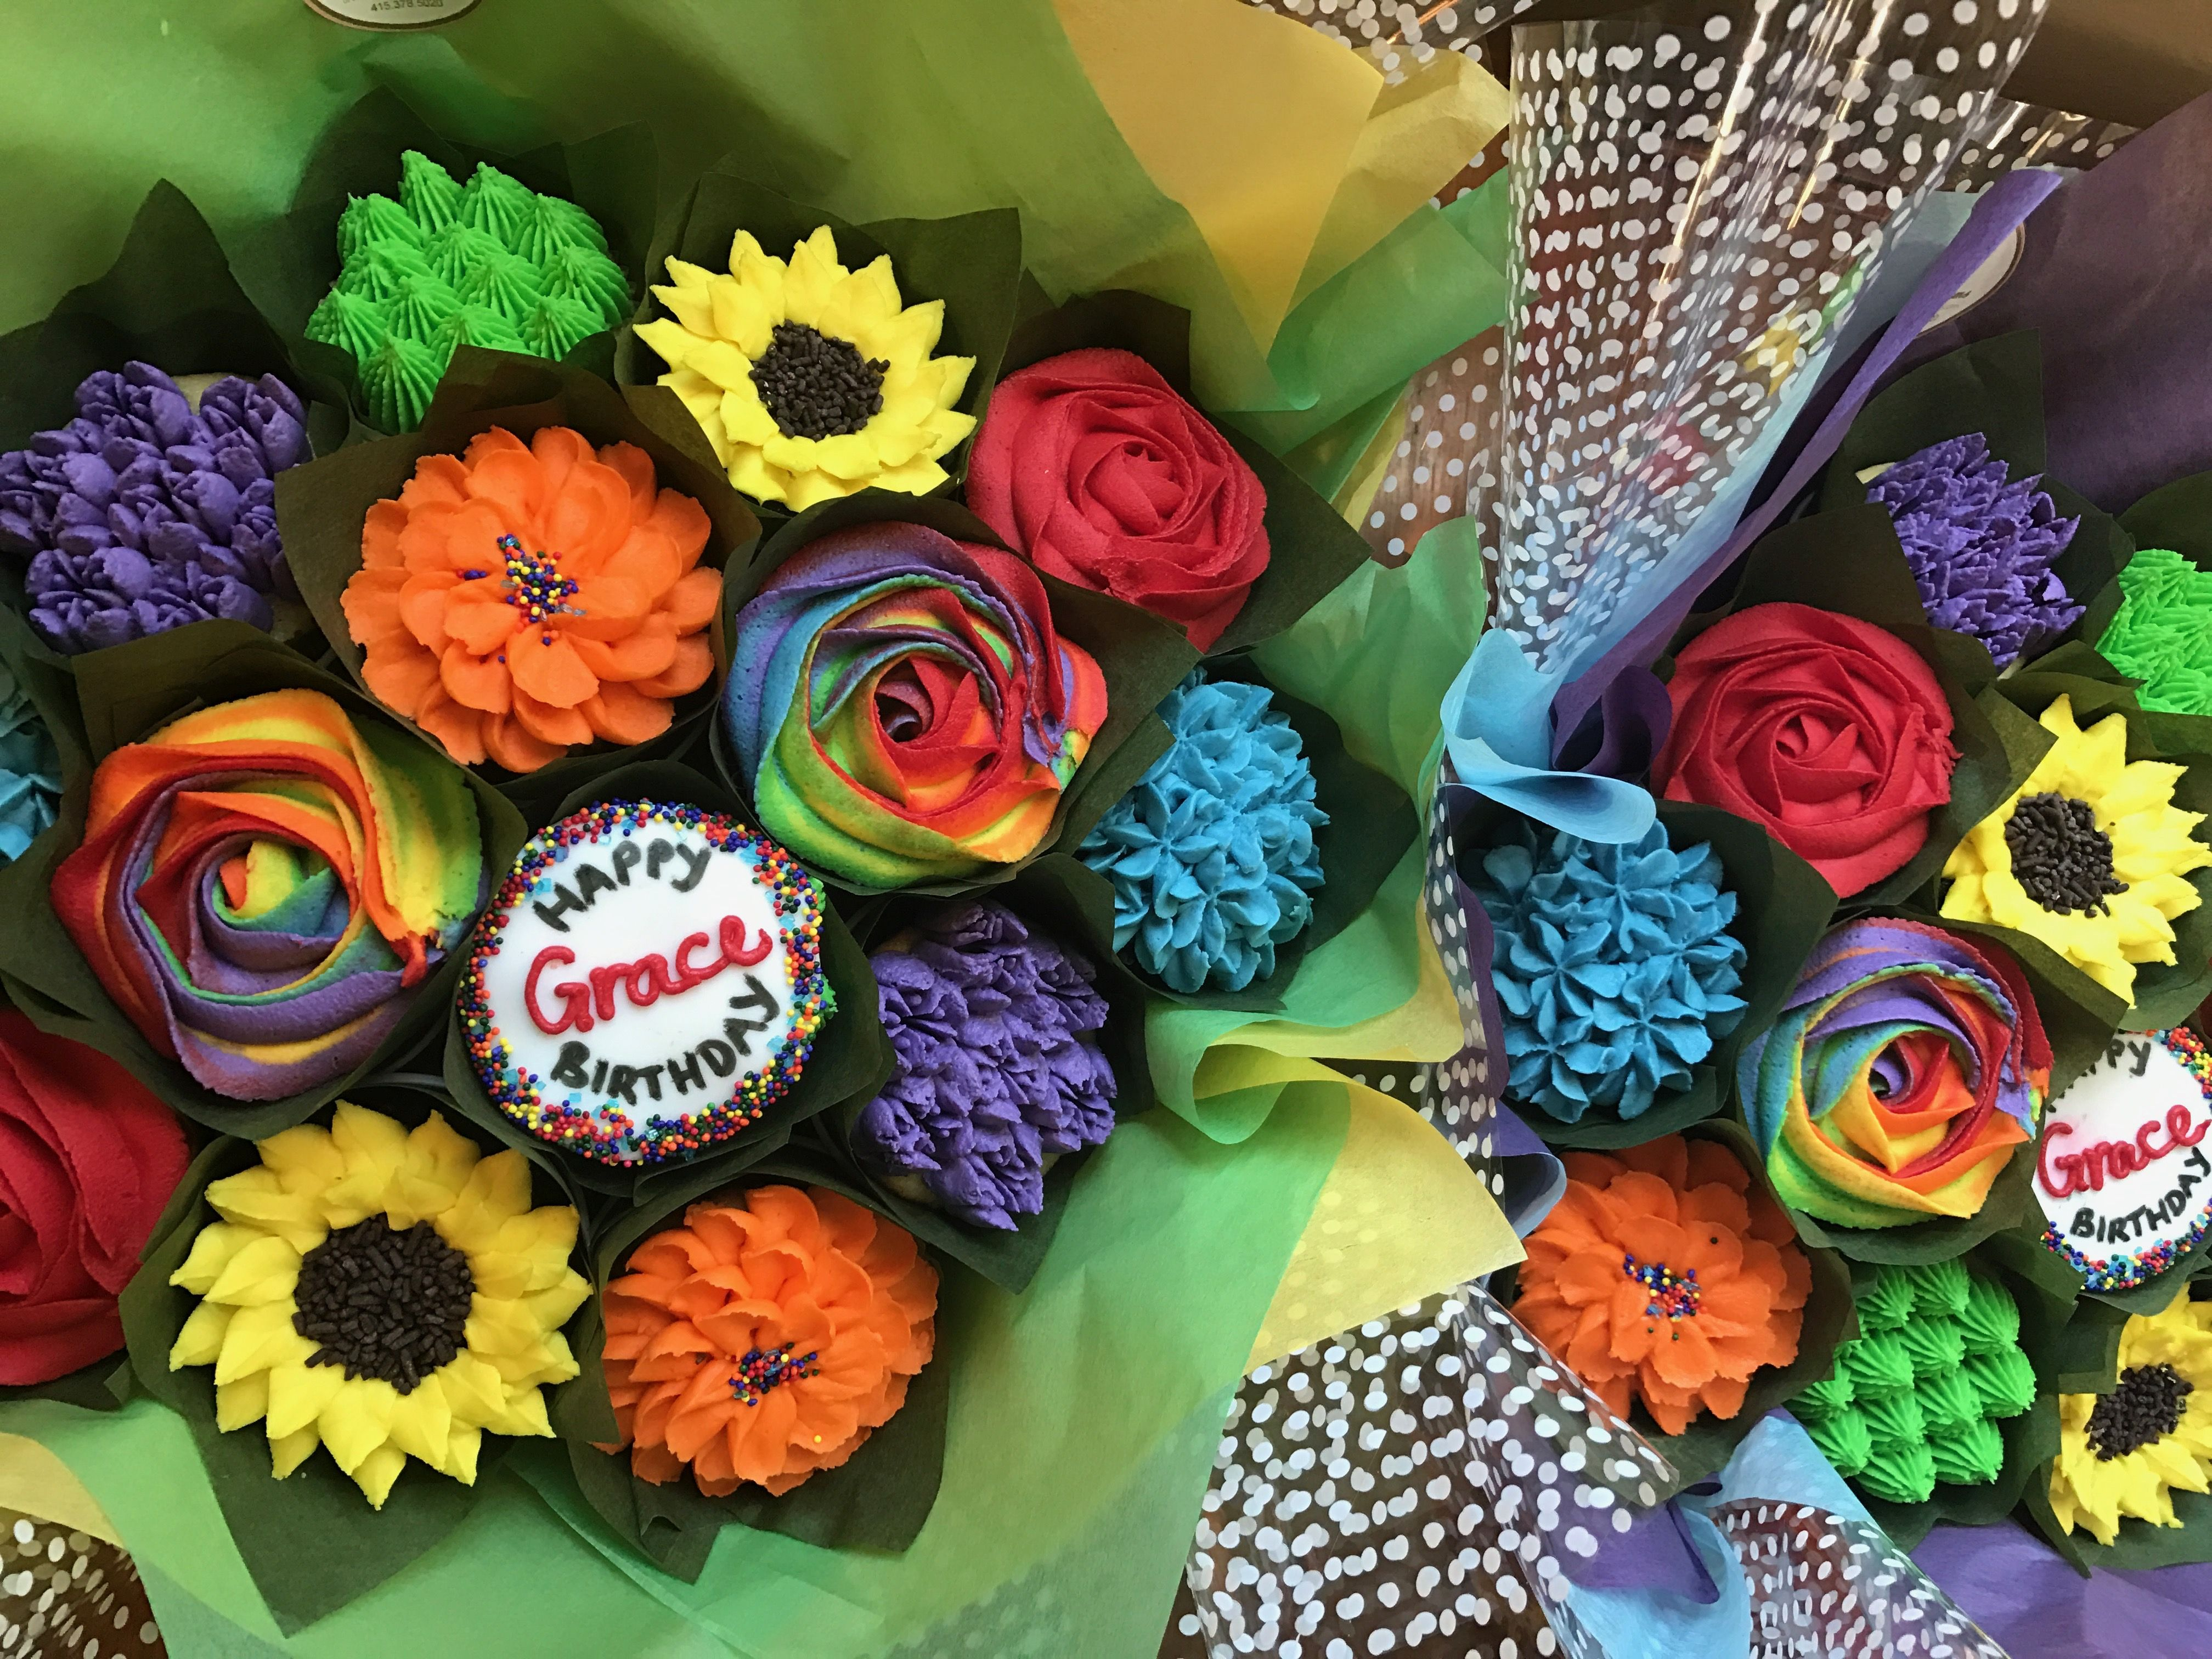 Happy Birthday Rainbow Bouquets 🌈 Www.bakedblooms.com